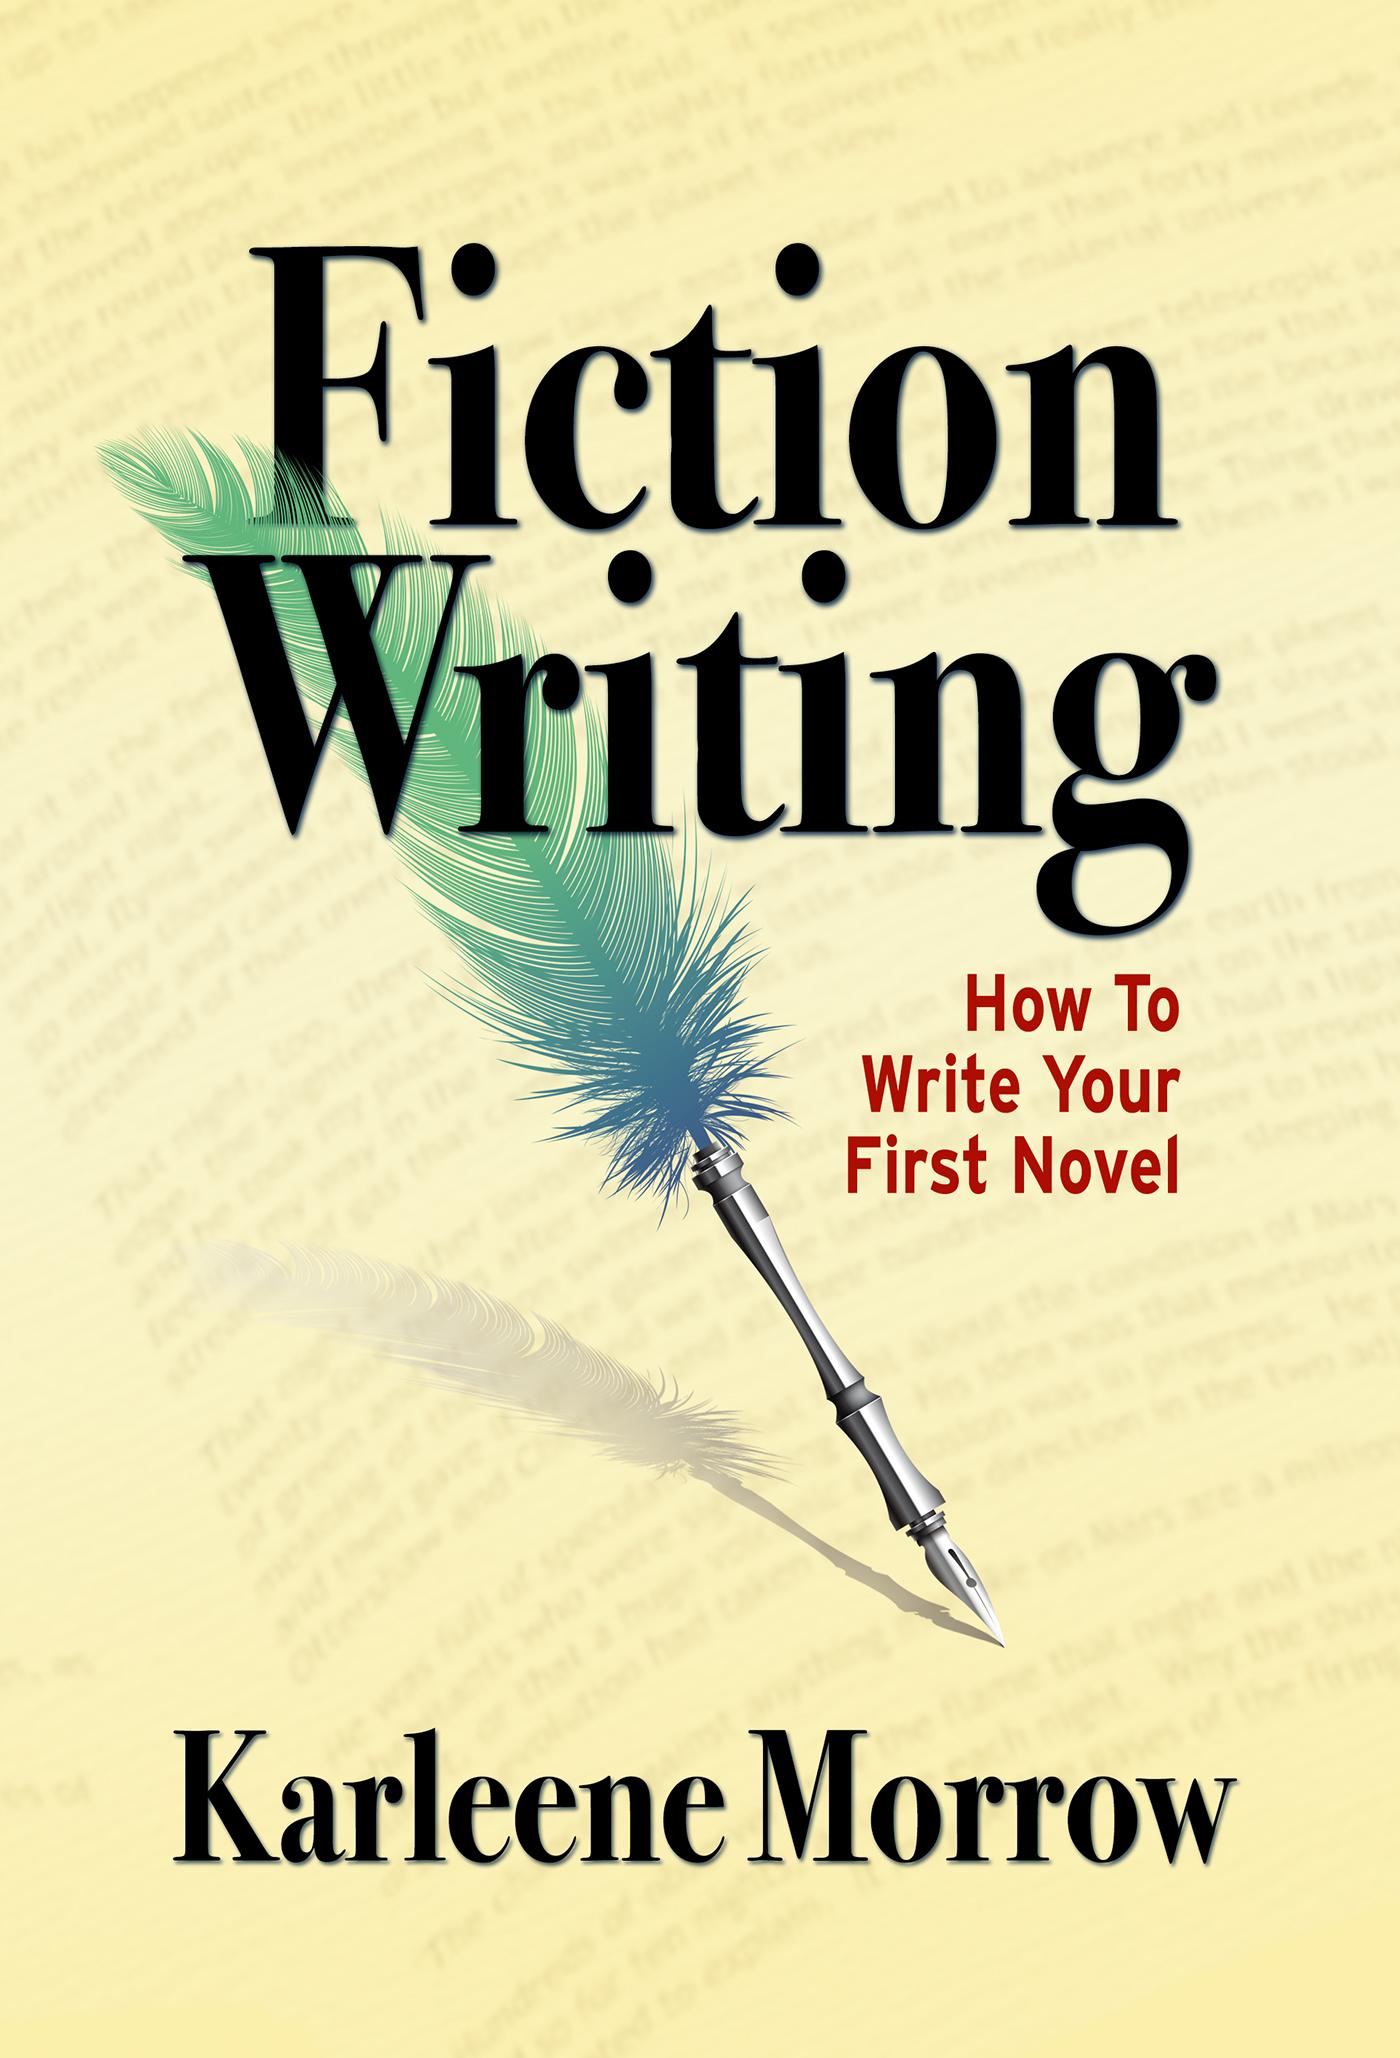 Fiction Writing: How to Write Your First Novel, an Ebook by Karleene Morrow